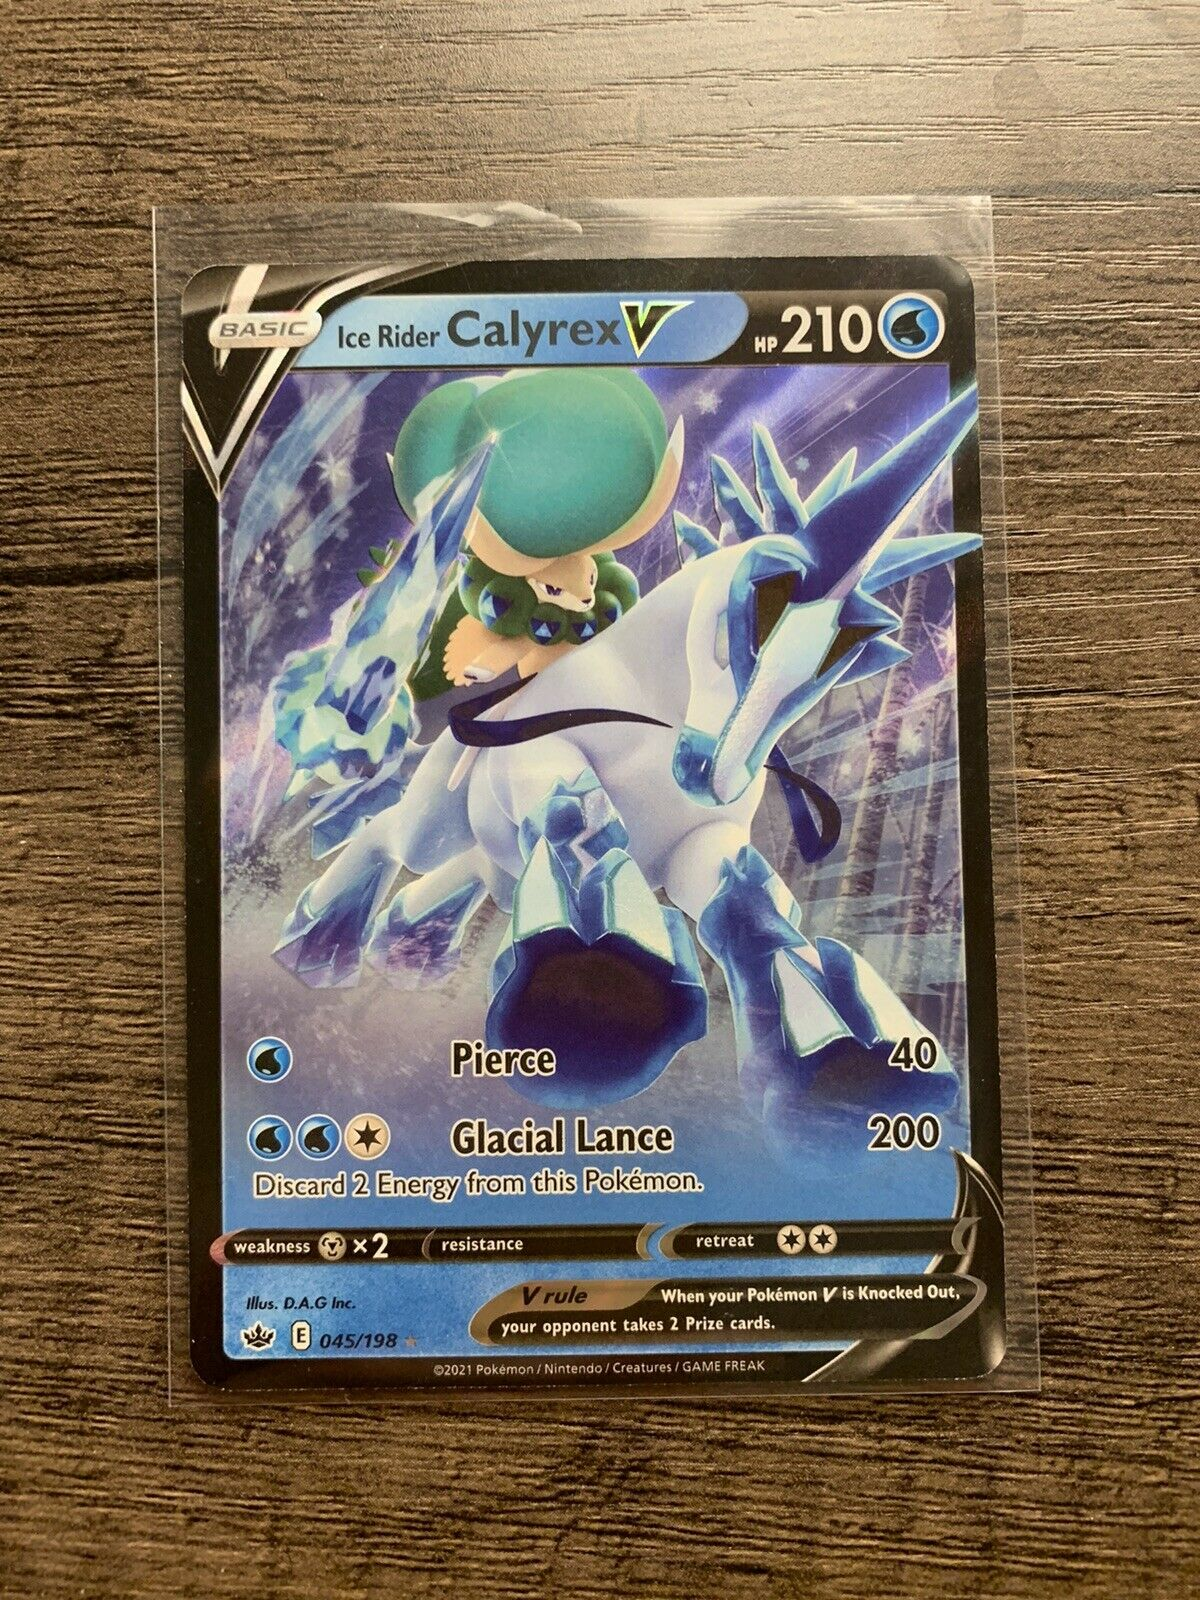 Ice Rider Calyrex V Pokémon TCG Chilling Reign 045/198 Mint Ultra Rare